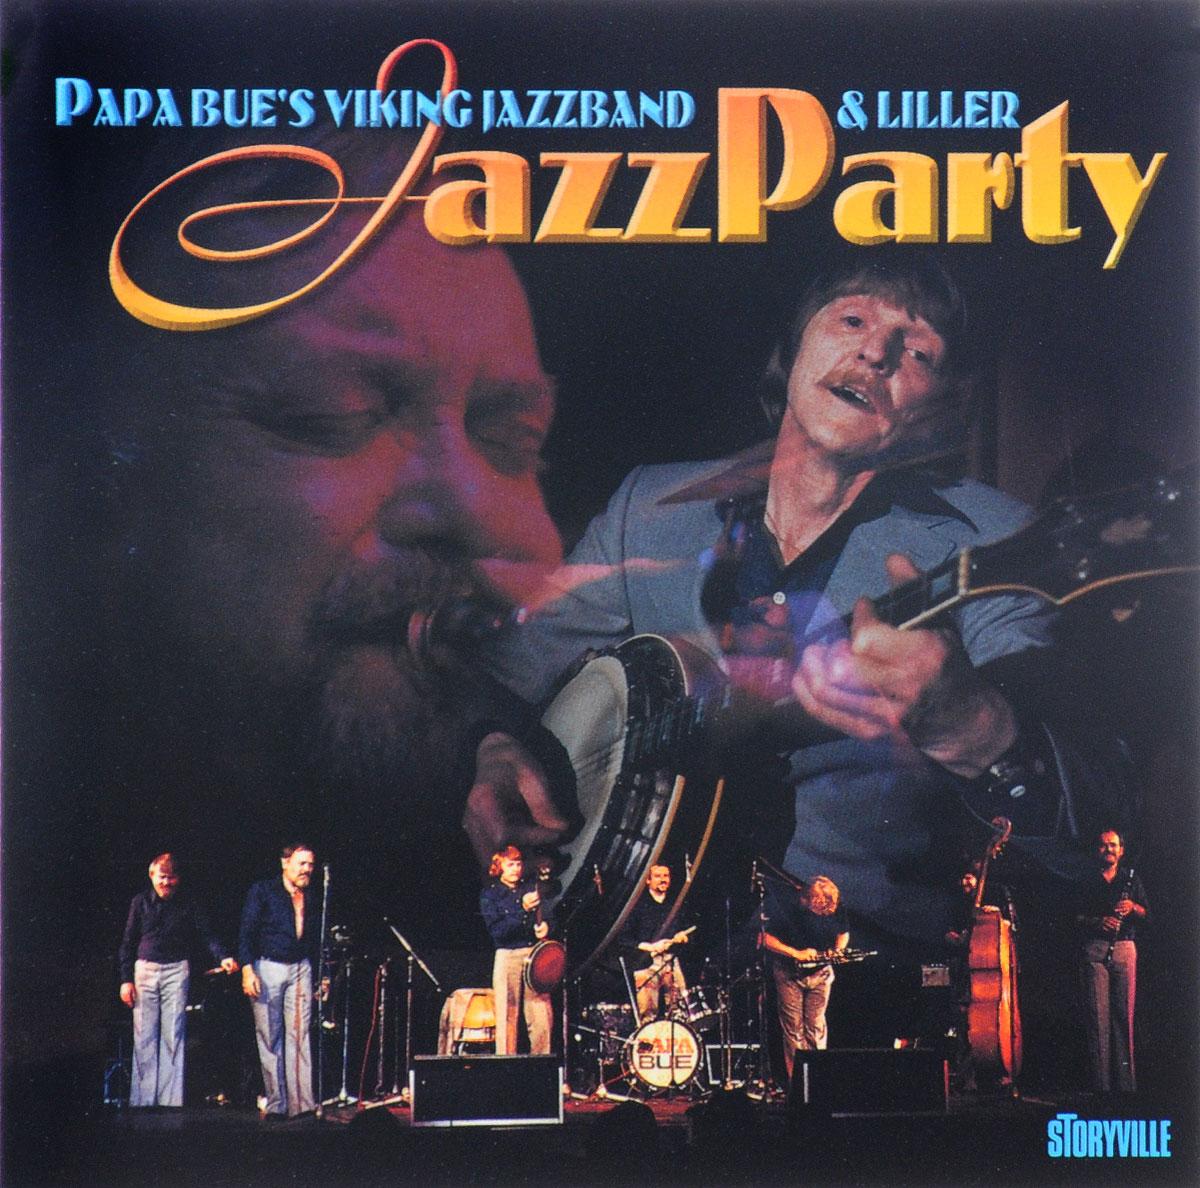 Papa Bue's Viking Jazz Band,Liller Papa Bue's Viking Jazzband & Liller. Jazzparty nobo viking c2f 05 xsc